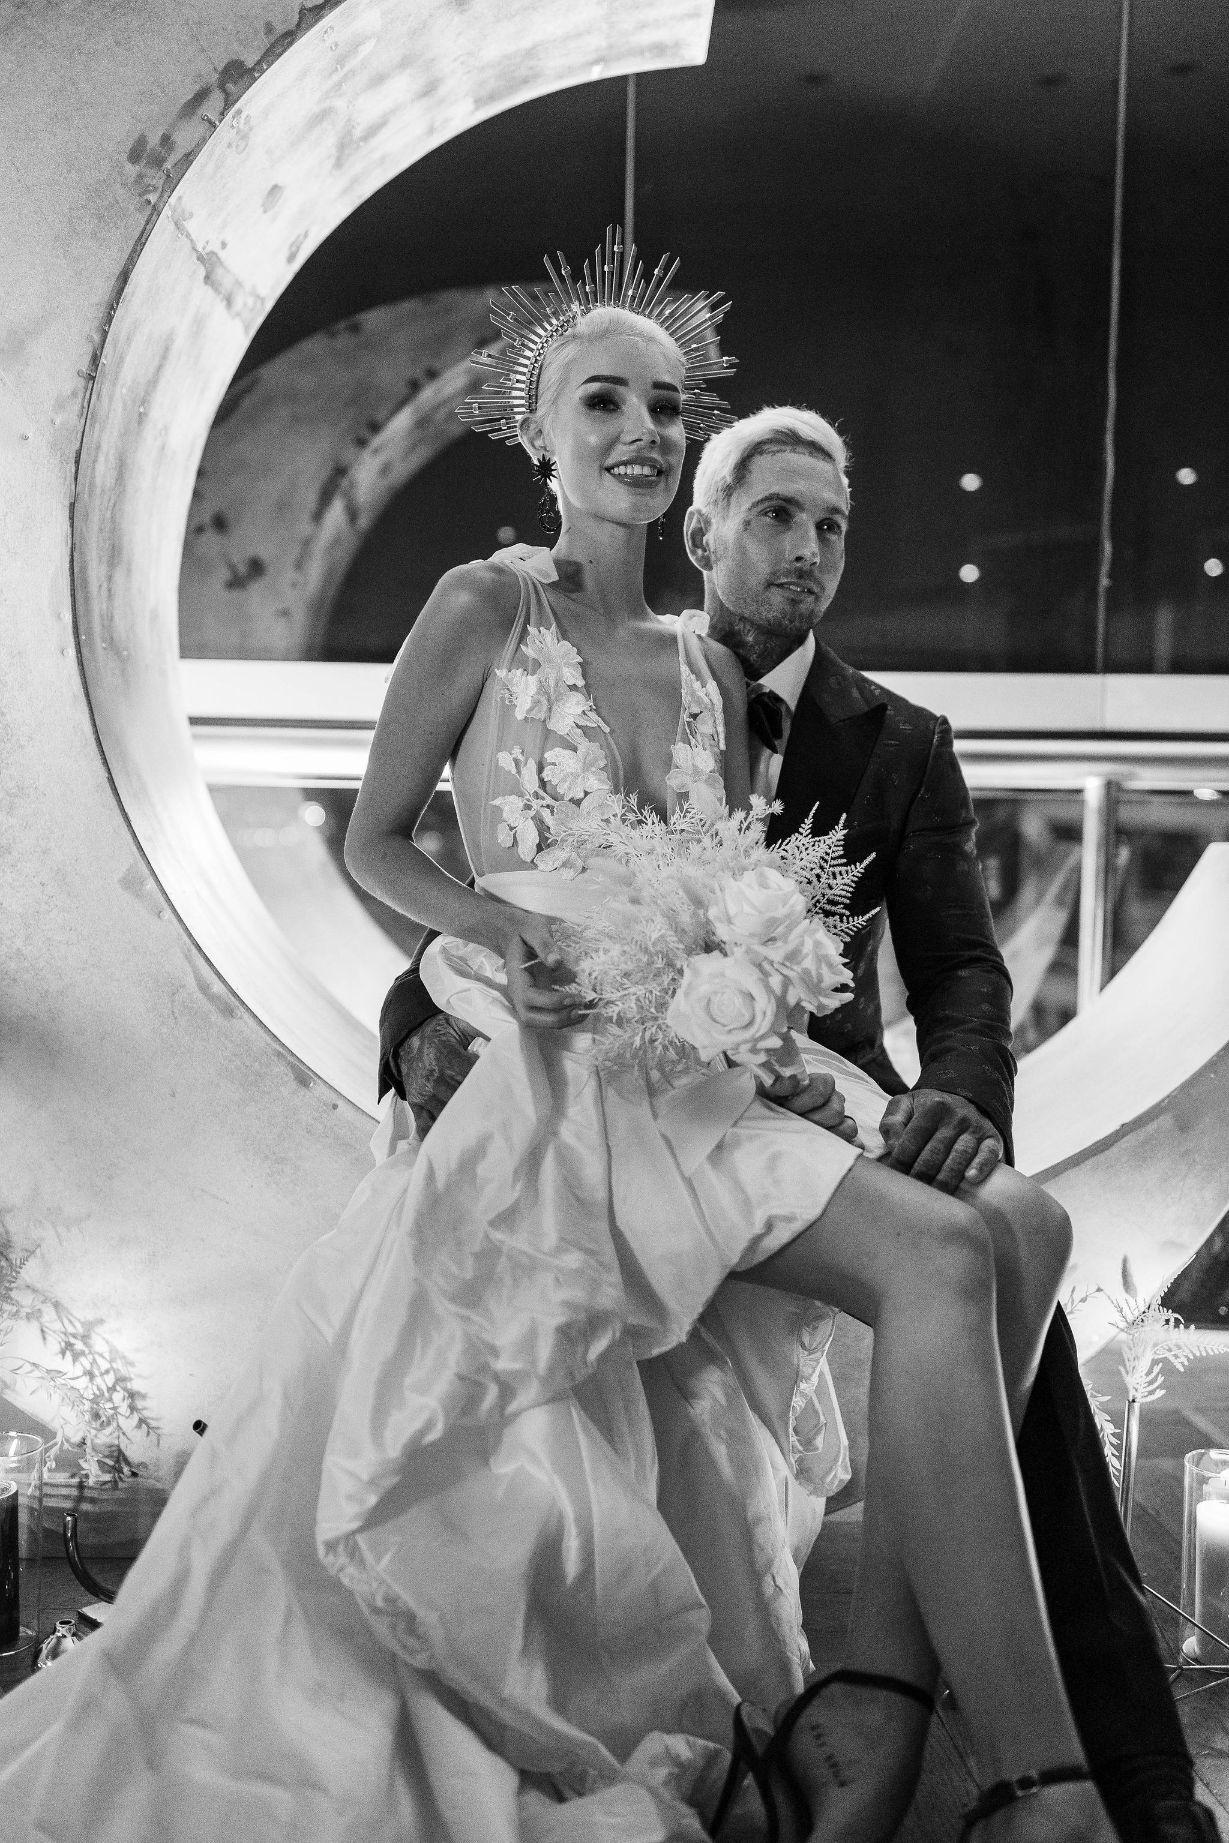 brisbane wedding shoot images by pixel punk pictures